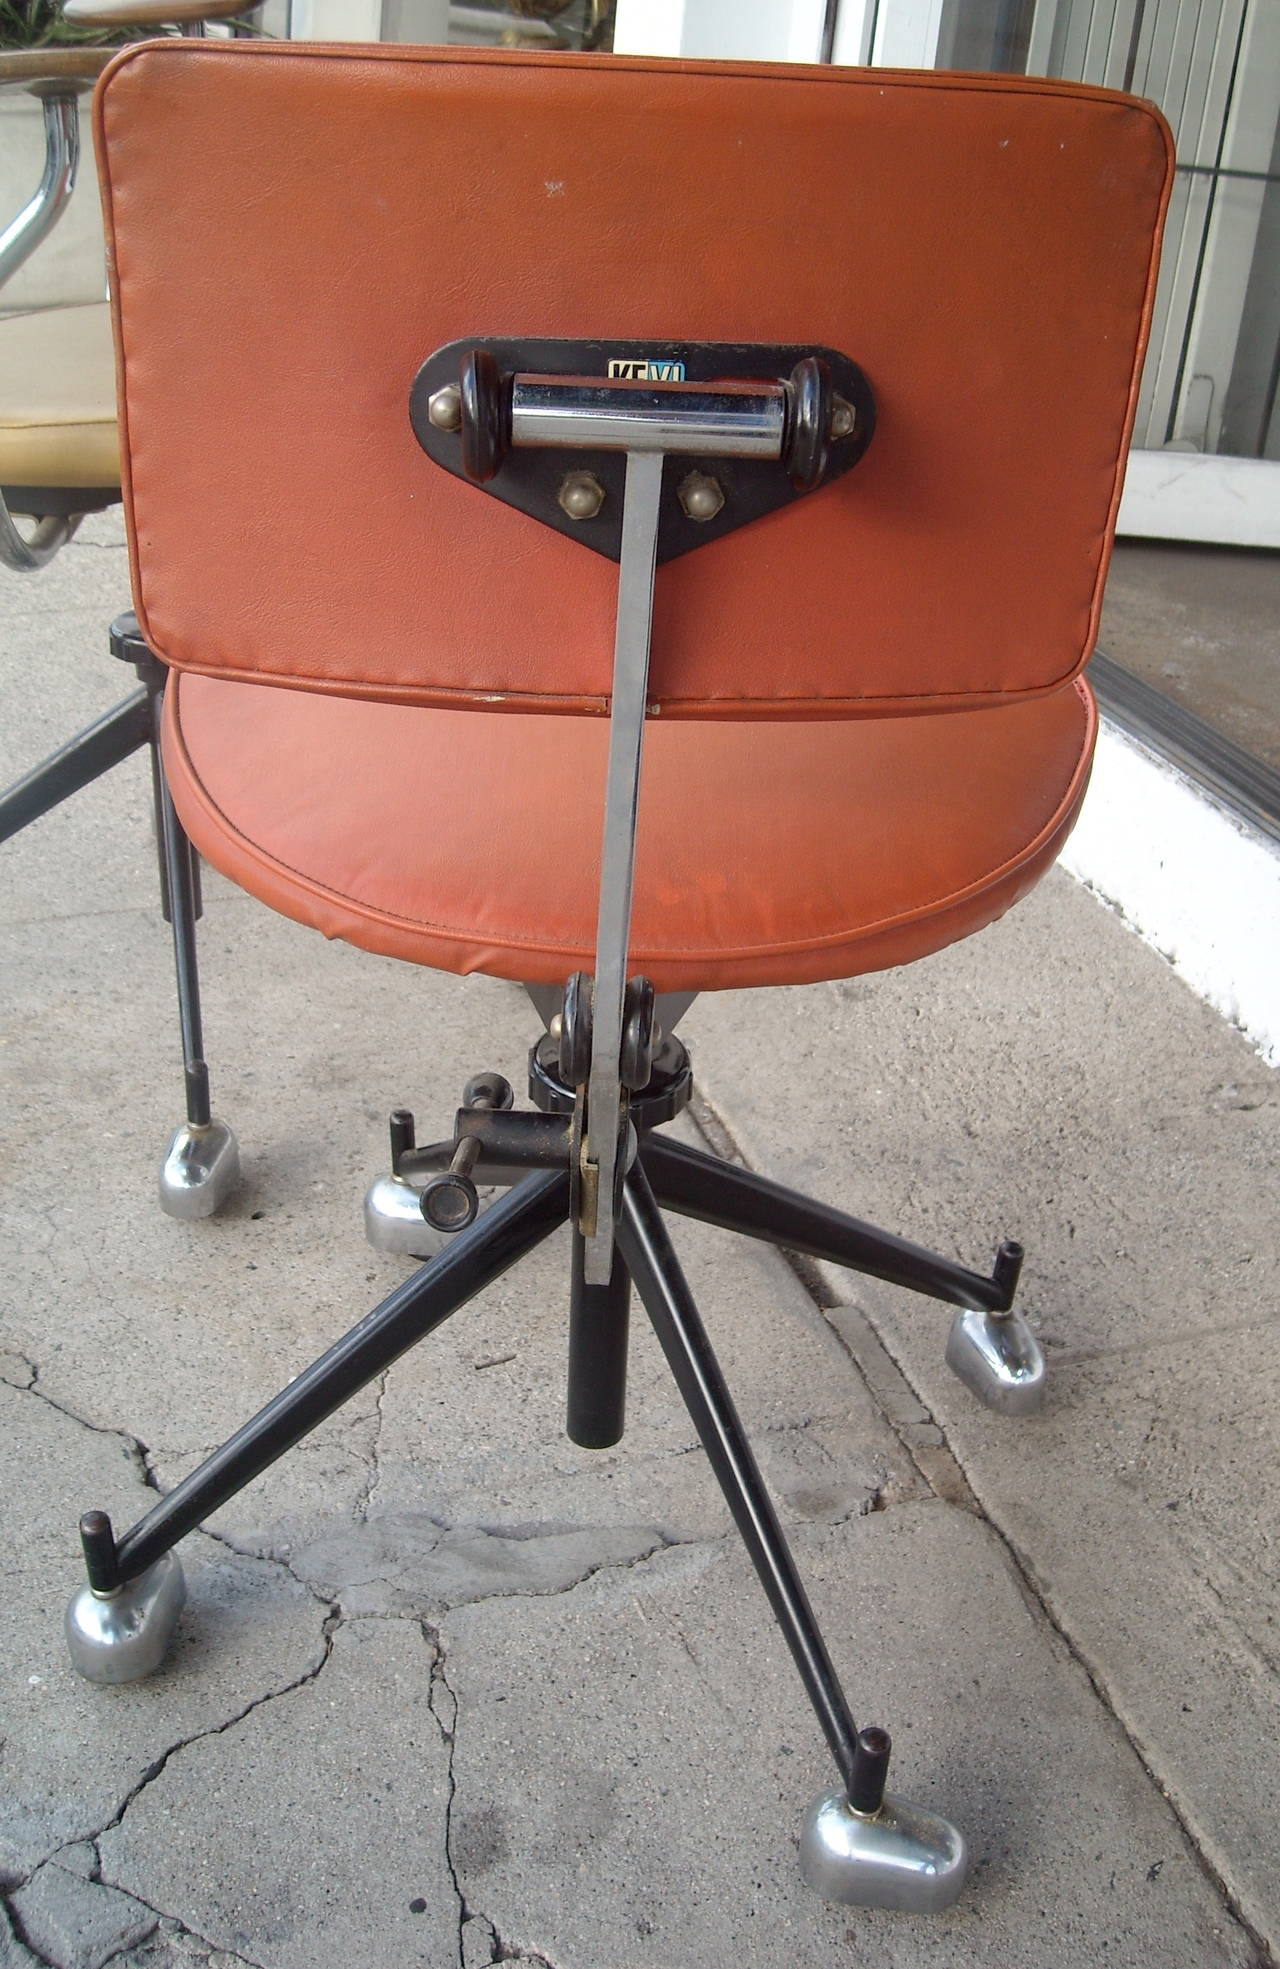 J¸rgen Rasmussen Two Industrial Modern Kevi fice or Desk Chairs